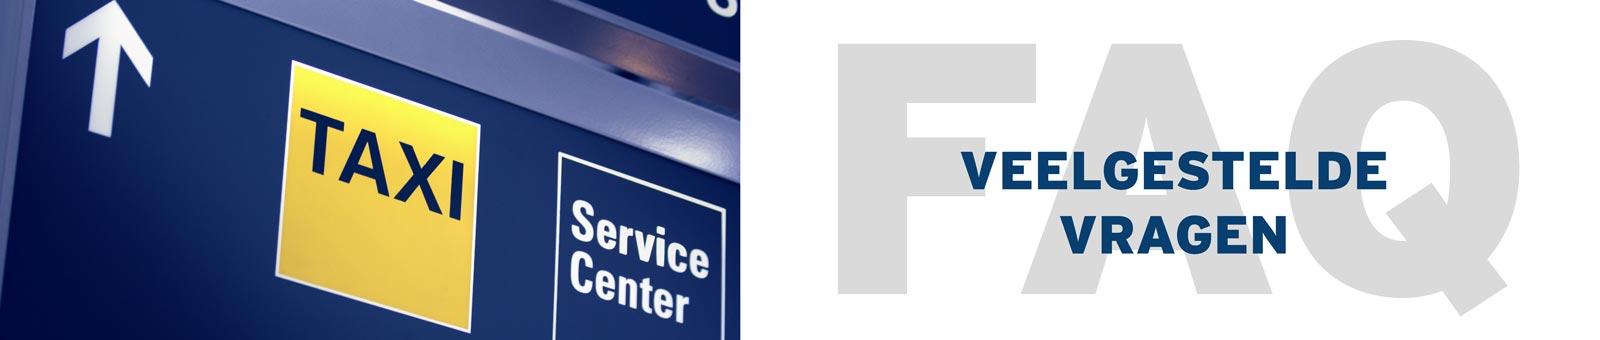 Taxi Manders - Veltrop FAQ